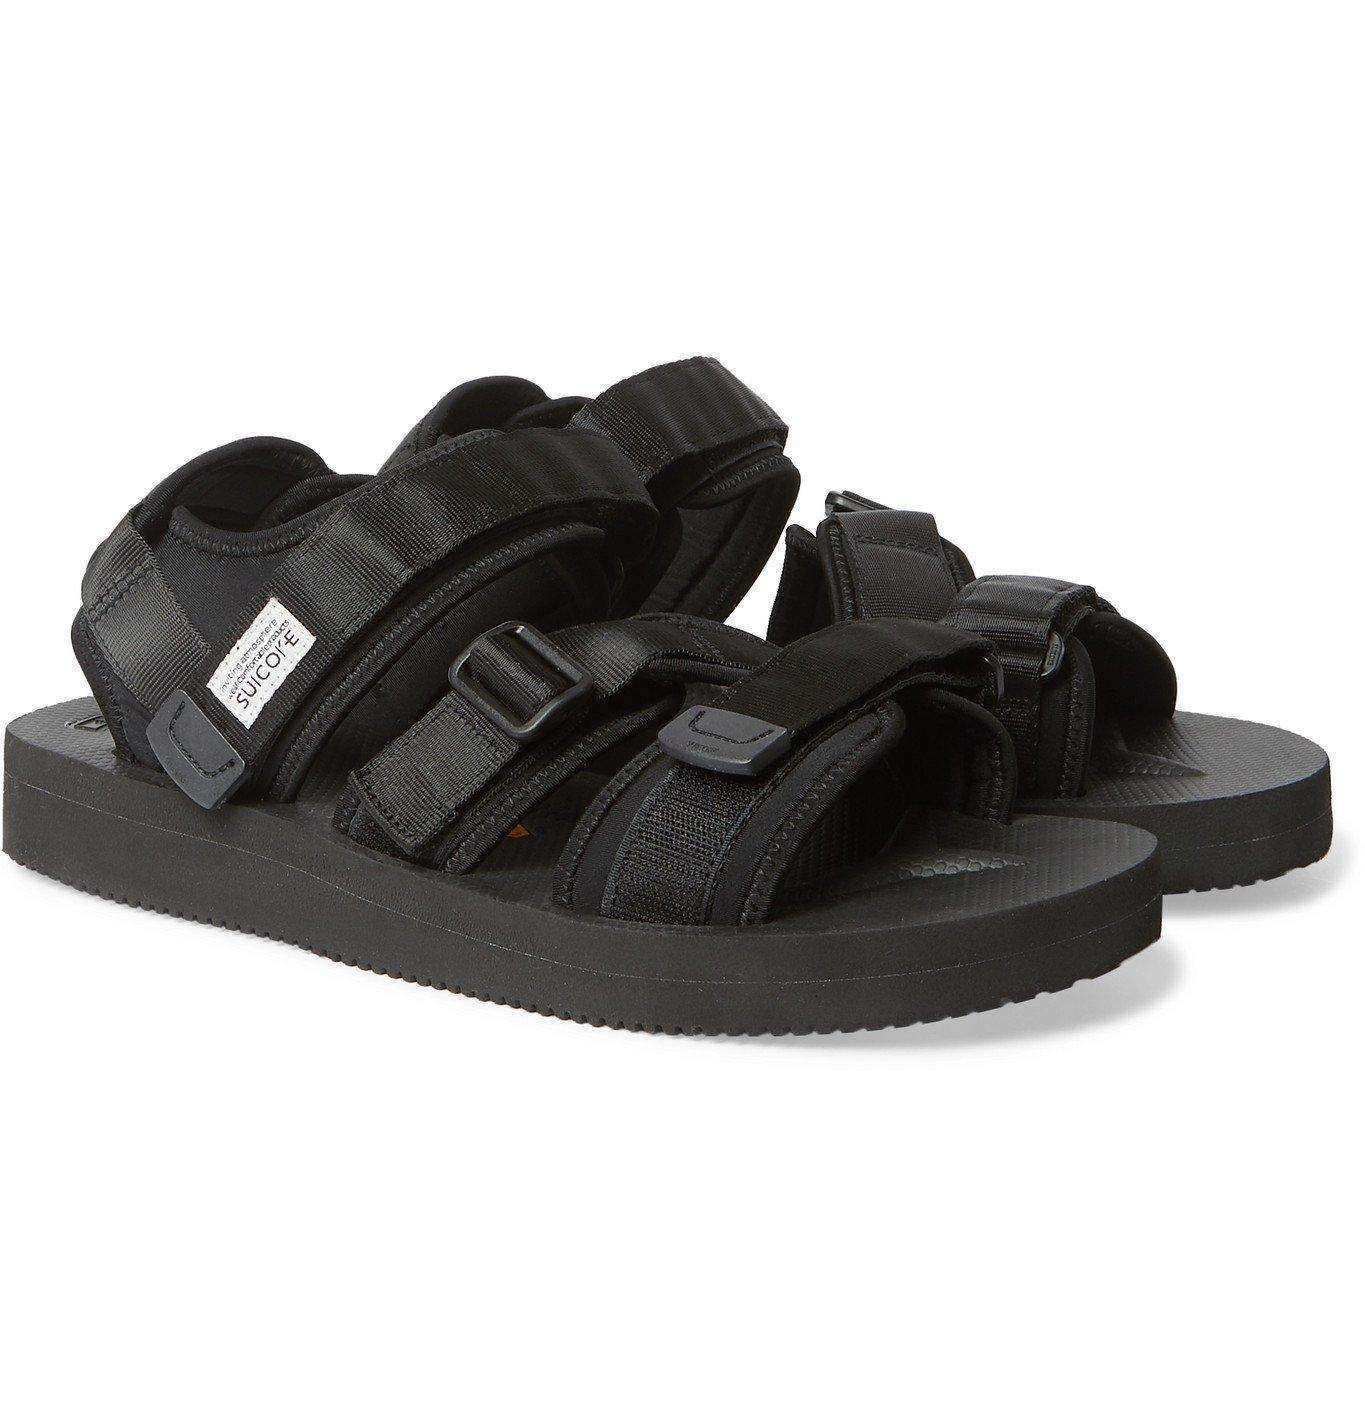 Photo: Suicoke - Kisee-V Webbing and Neoprene Sandals - Black